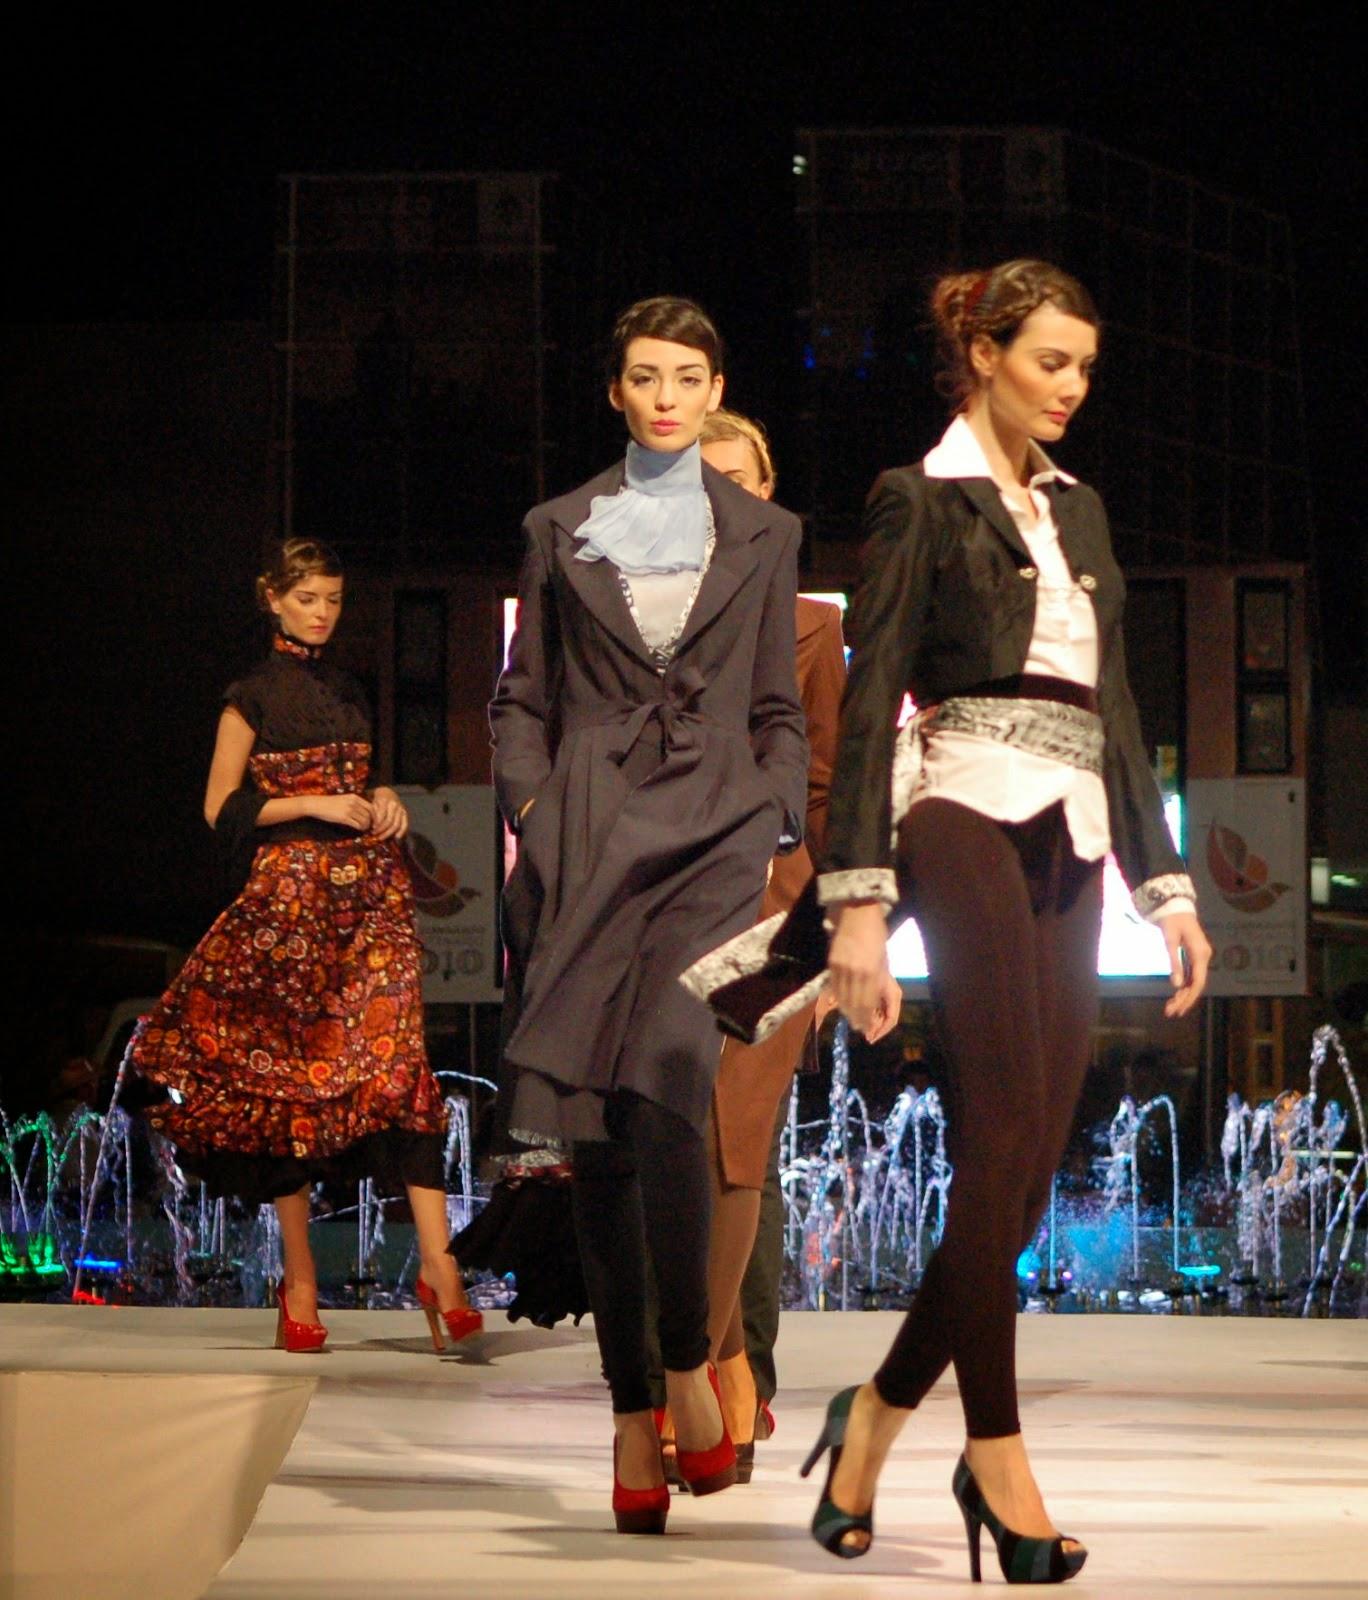 pineda covalin, carlo rossetti, modelos, expo bicentenario, moda y calzado, sapica.